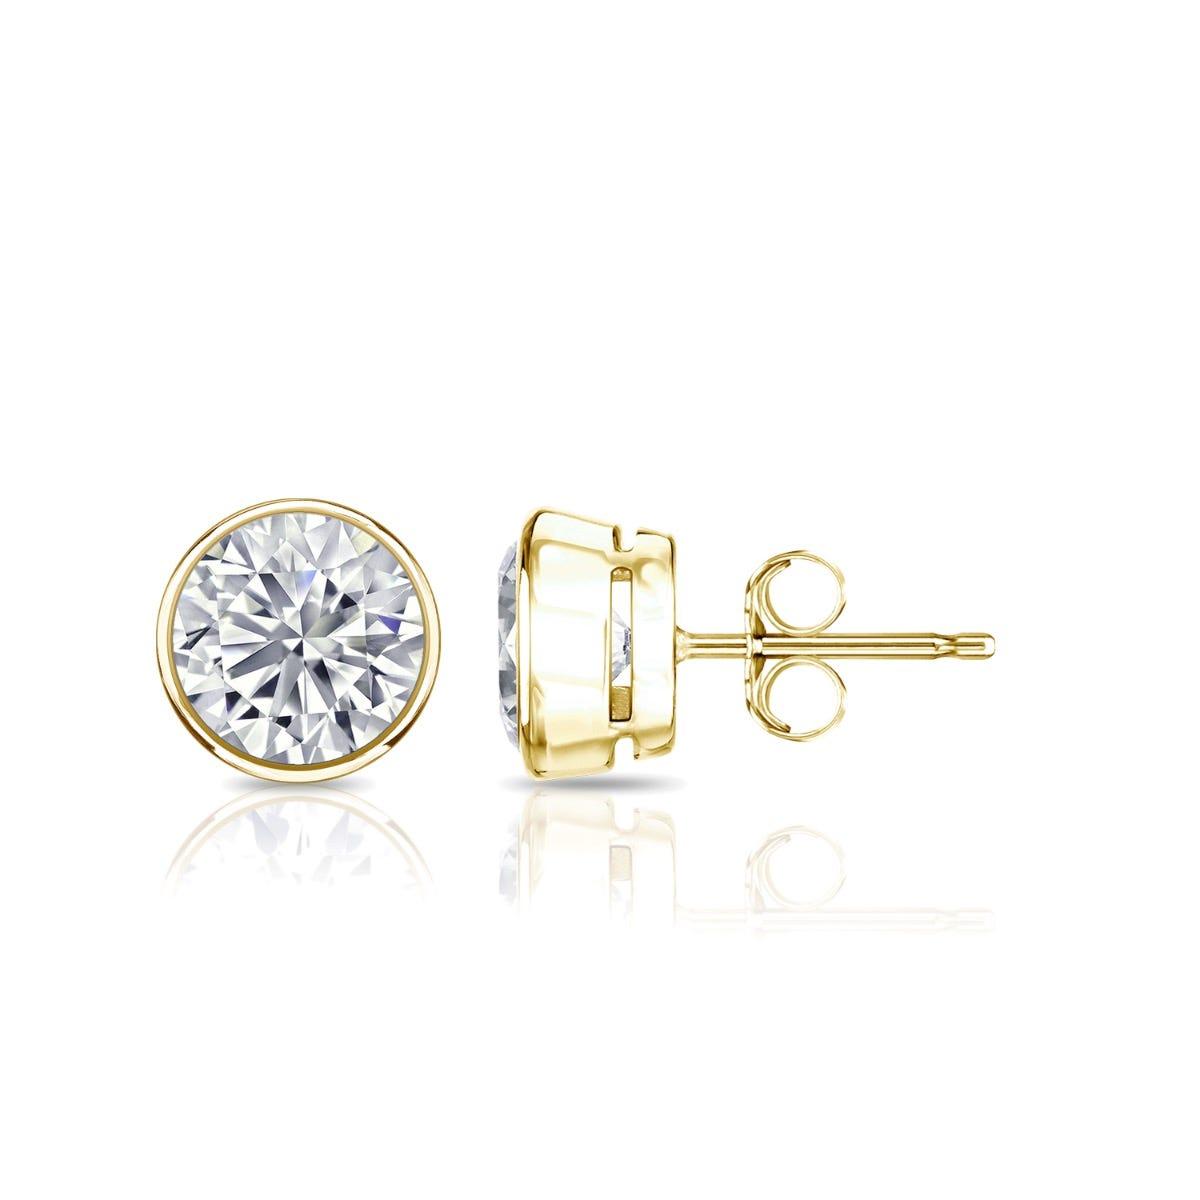 Diamond Round Bezel-Set 1ctw. Solitaire Stud (IJ-VS2) Earrings in 14K Yellow Gold